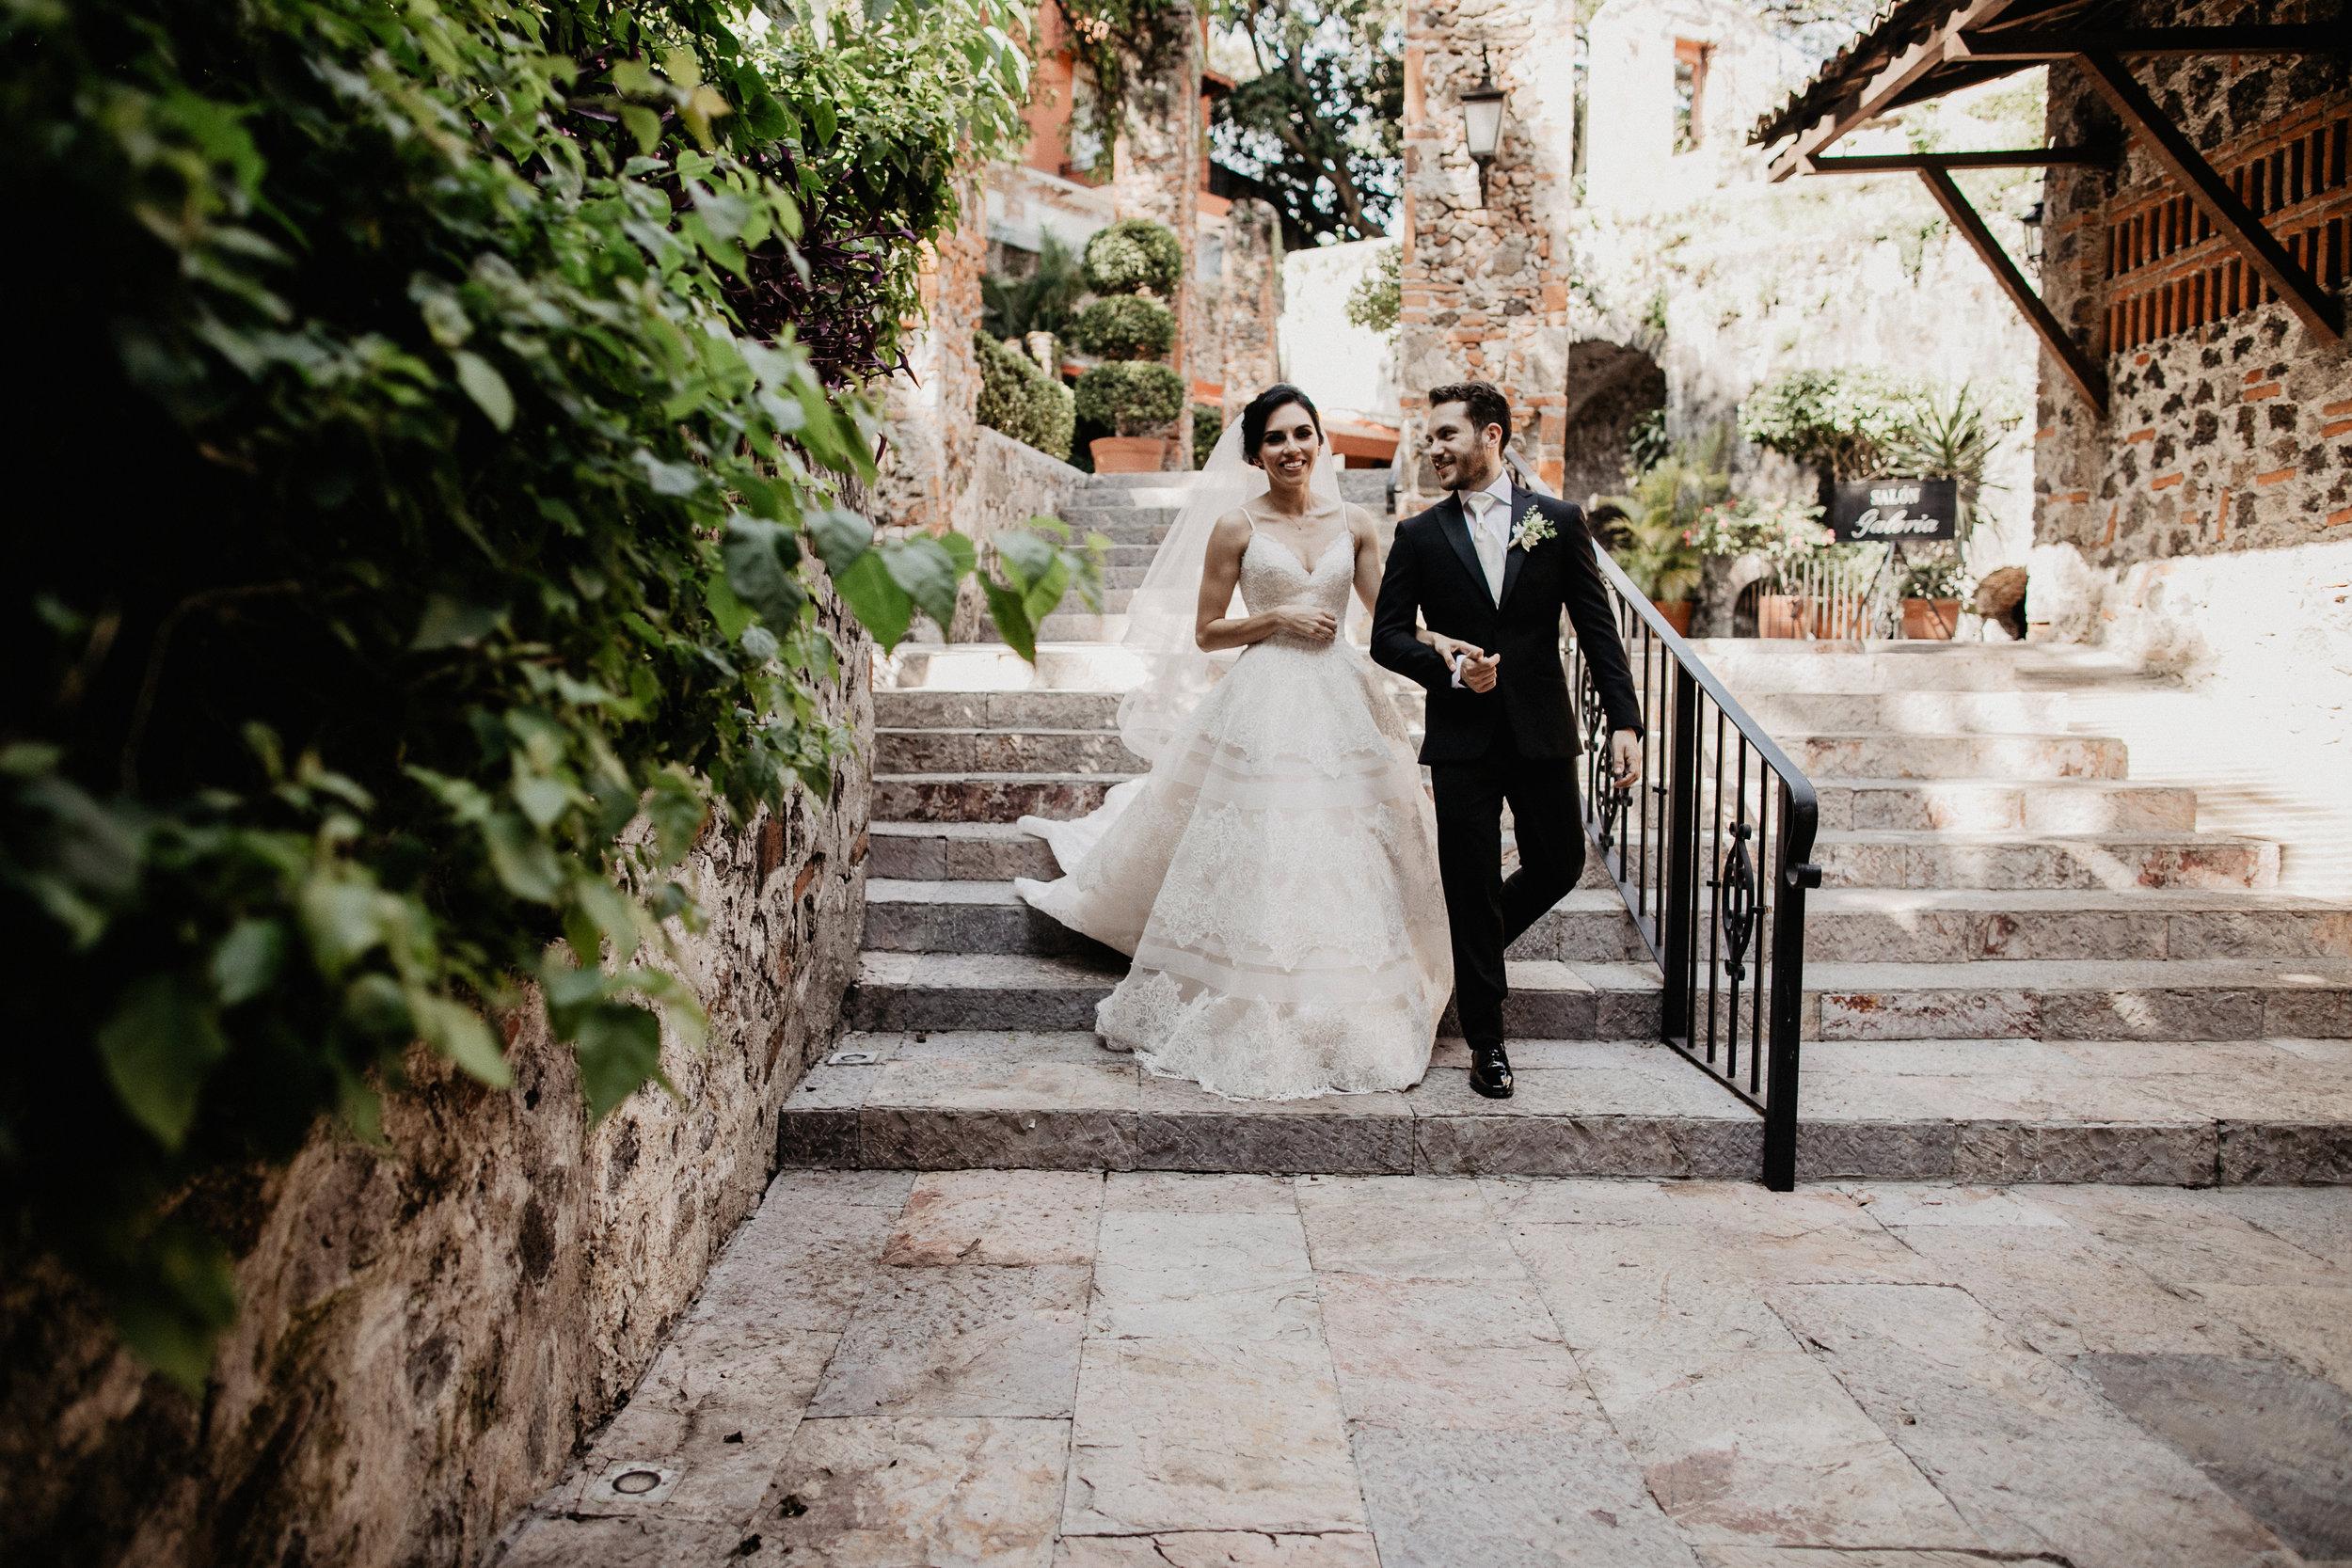 Alfonso_flores_destination_wedding_photography_vanesa_carlos-306.JPG